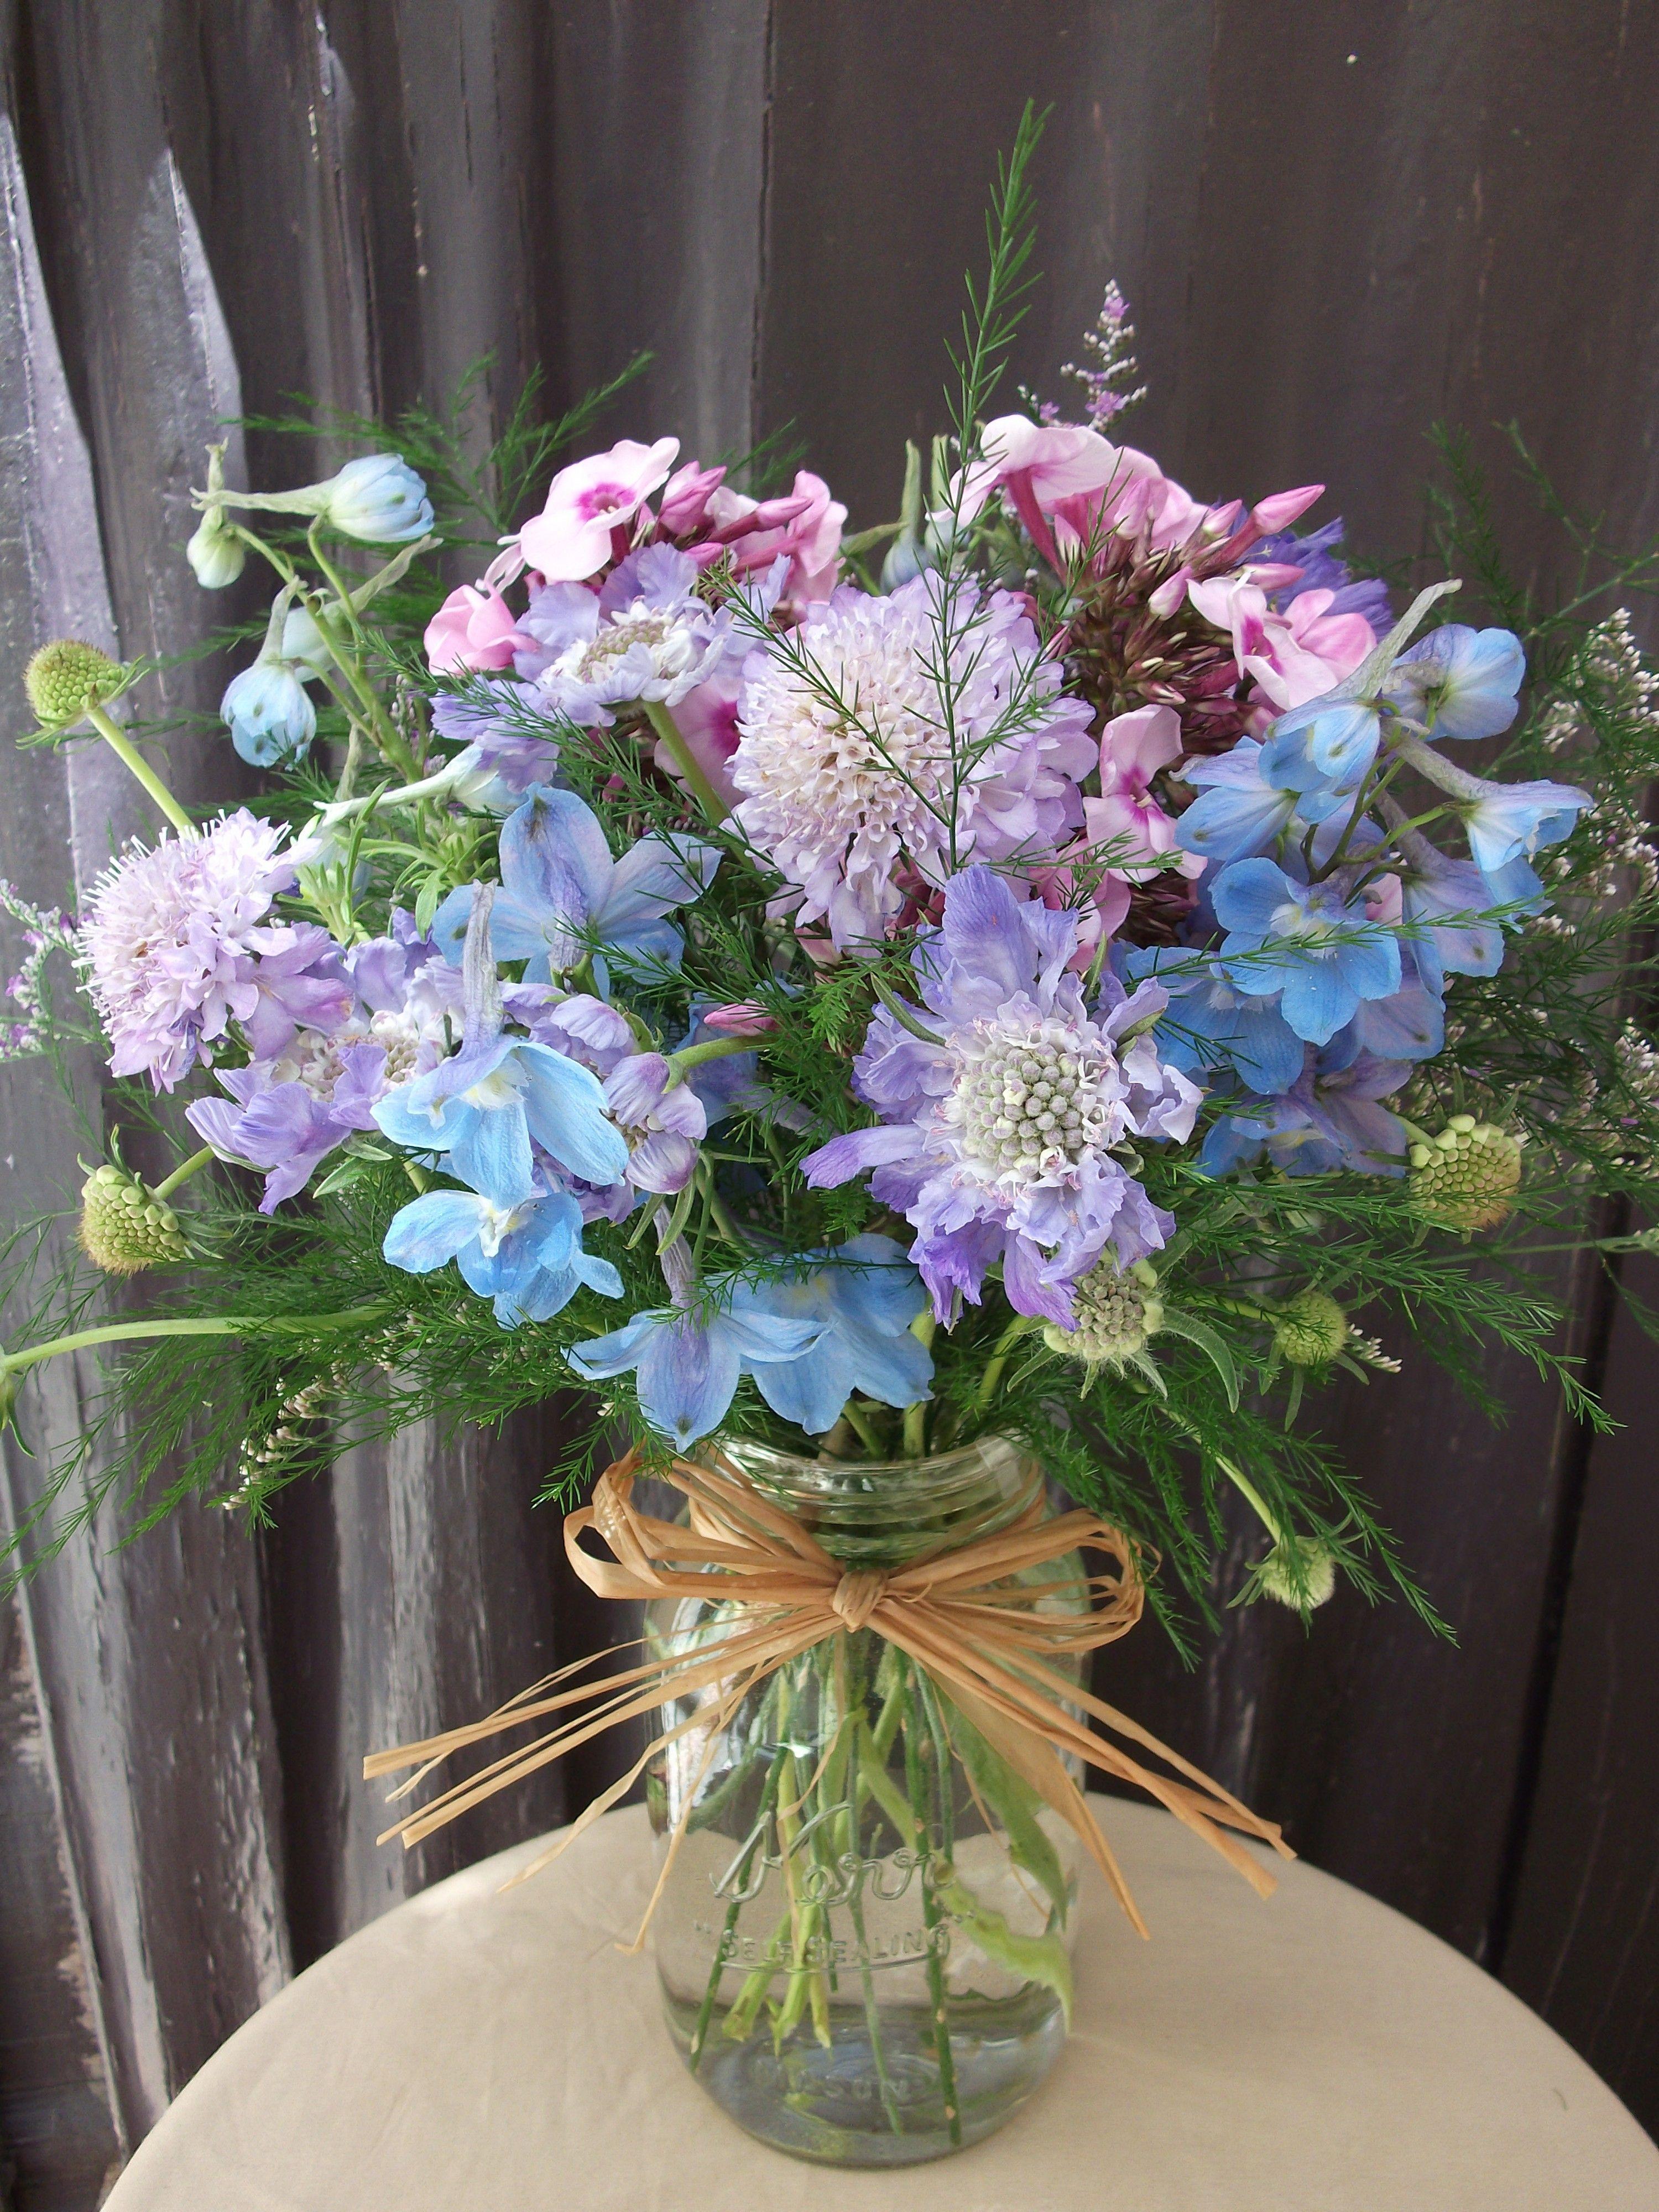 Wildflowery Mason Jar Mason jar flowers, Flower bouquet